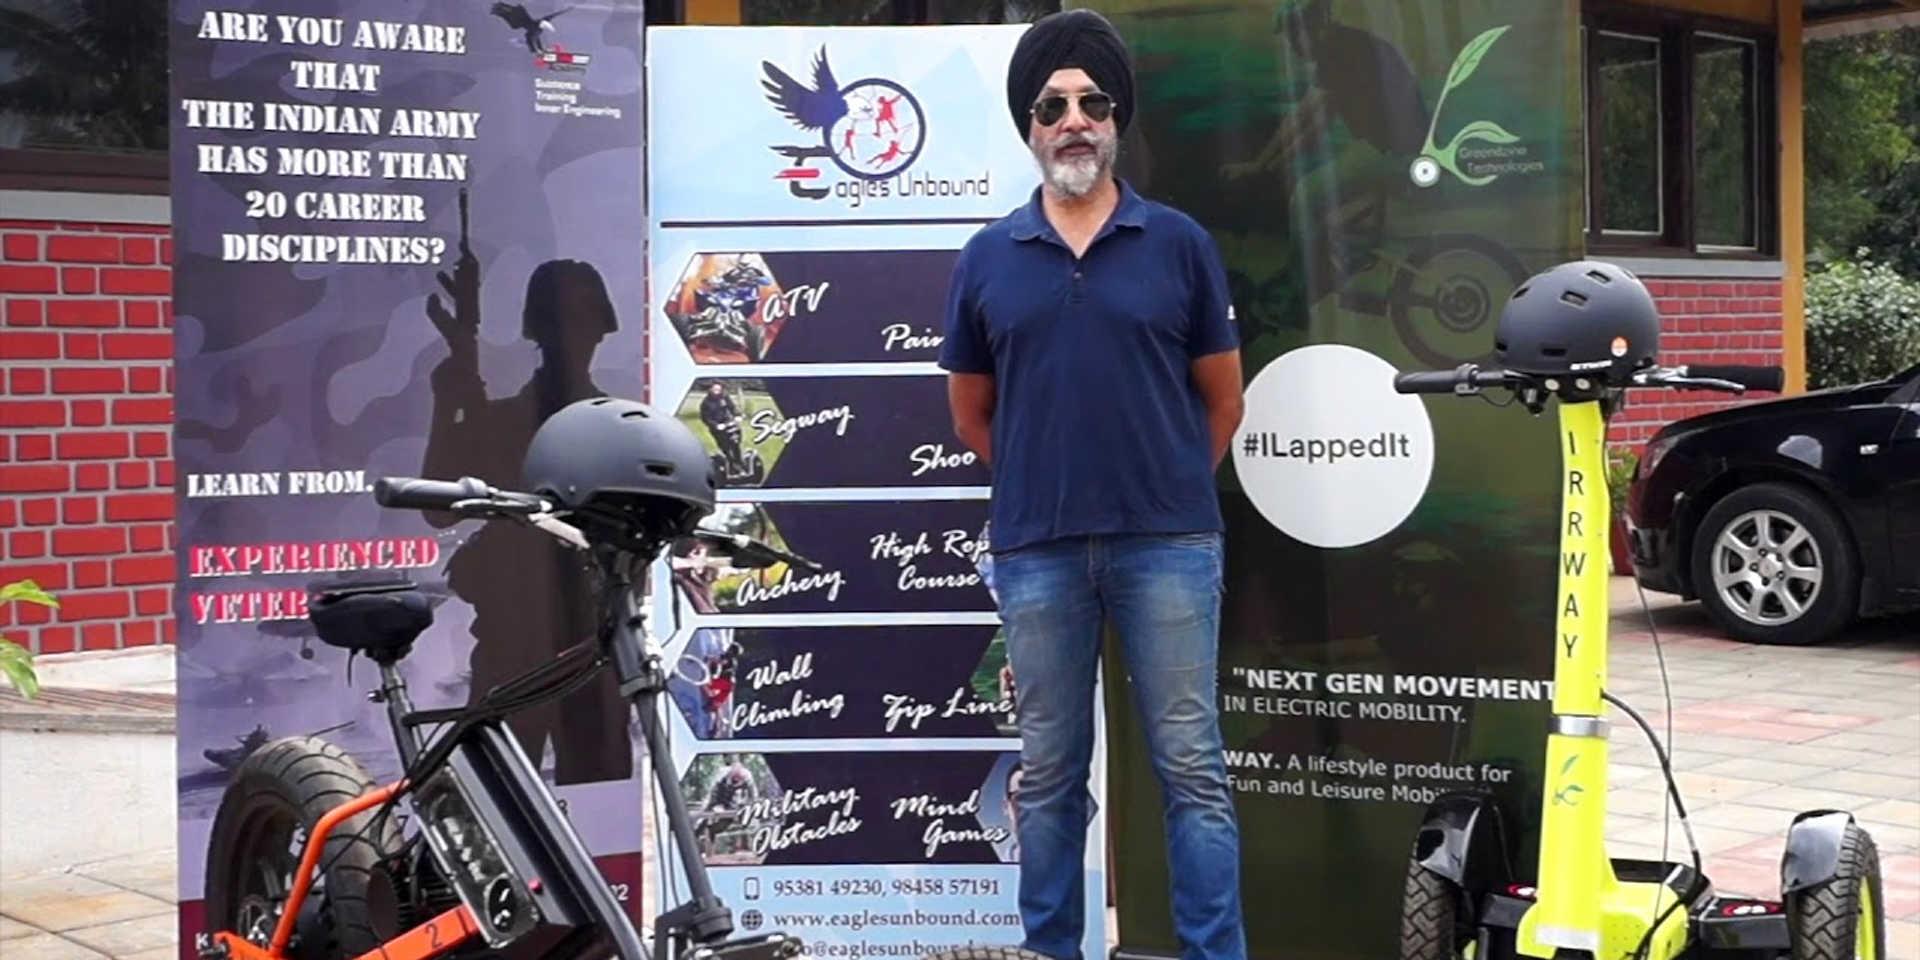 BRIG. Amardeep Singh, President, Eagles Unbound Resort